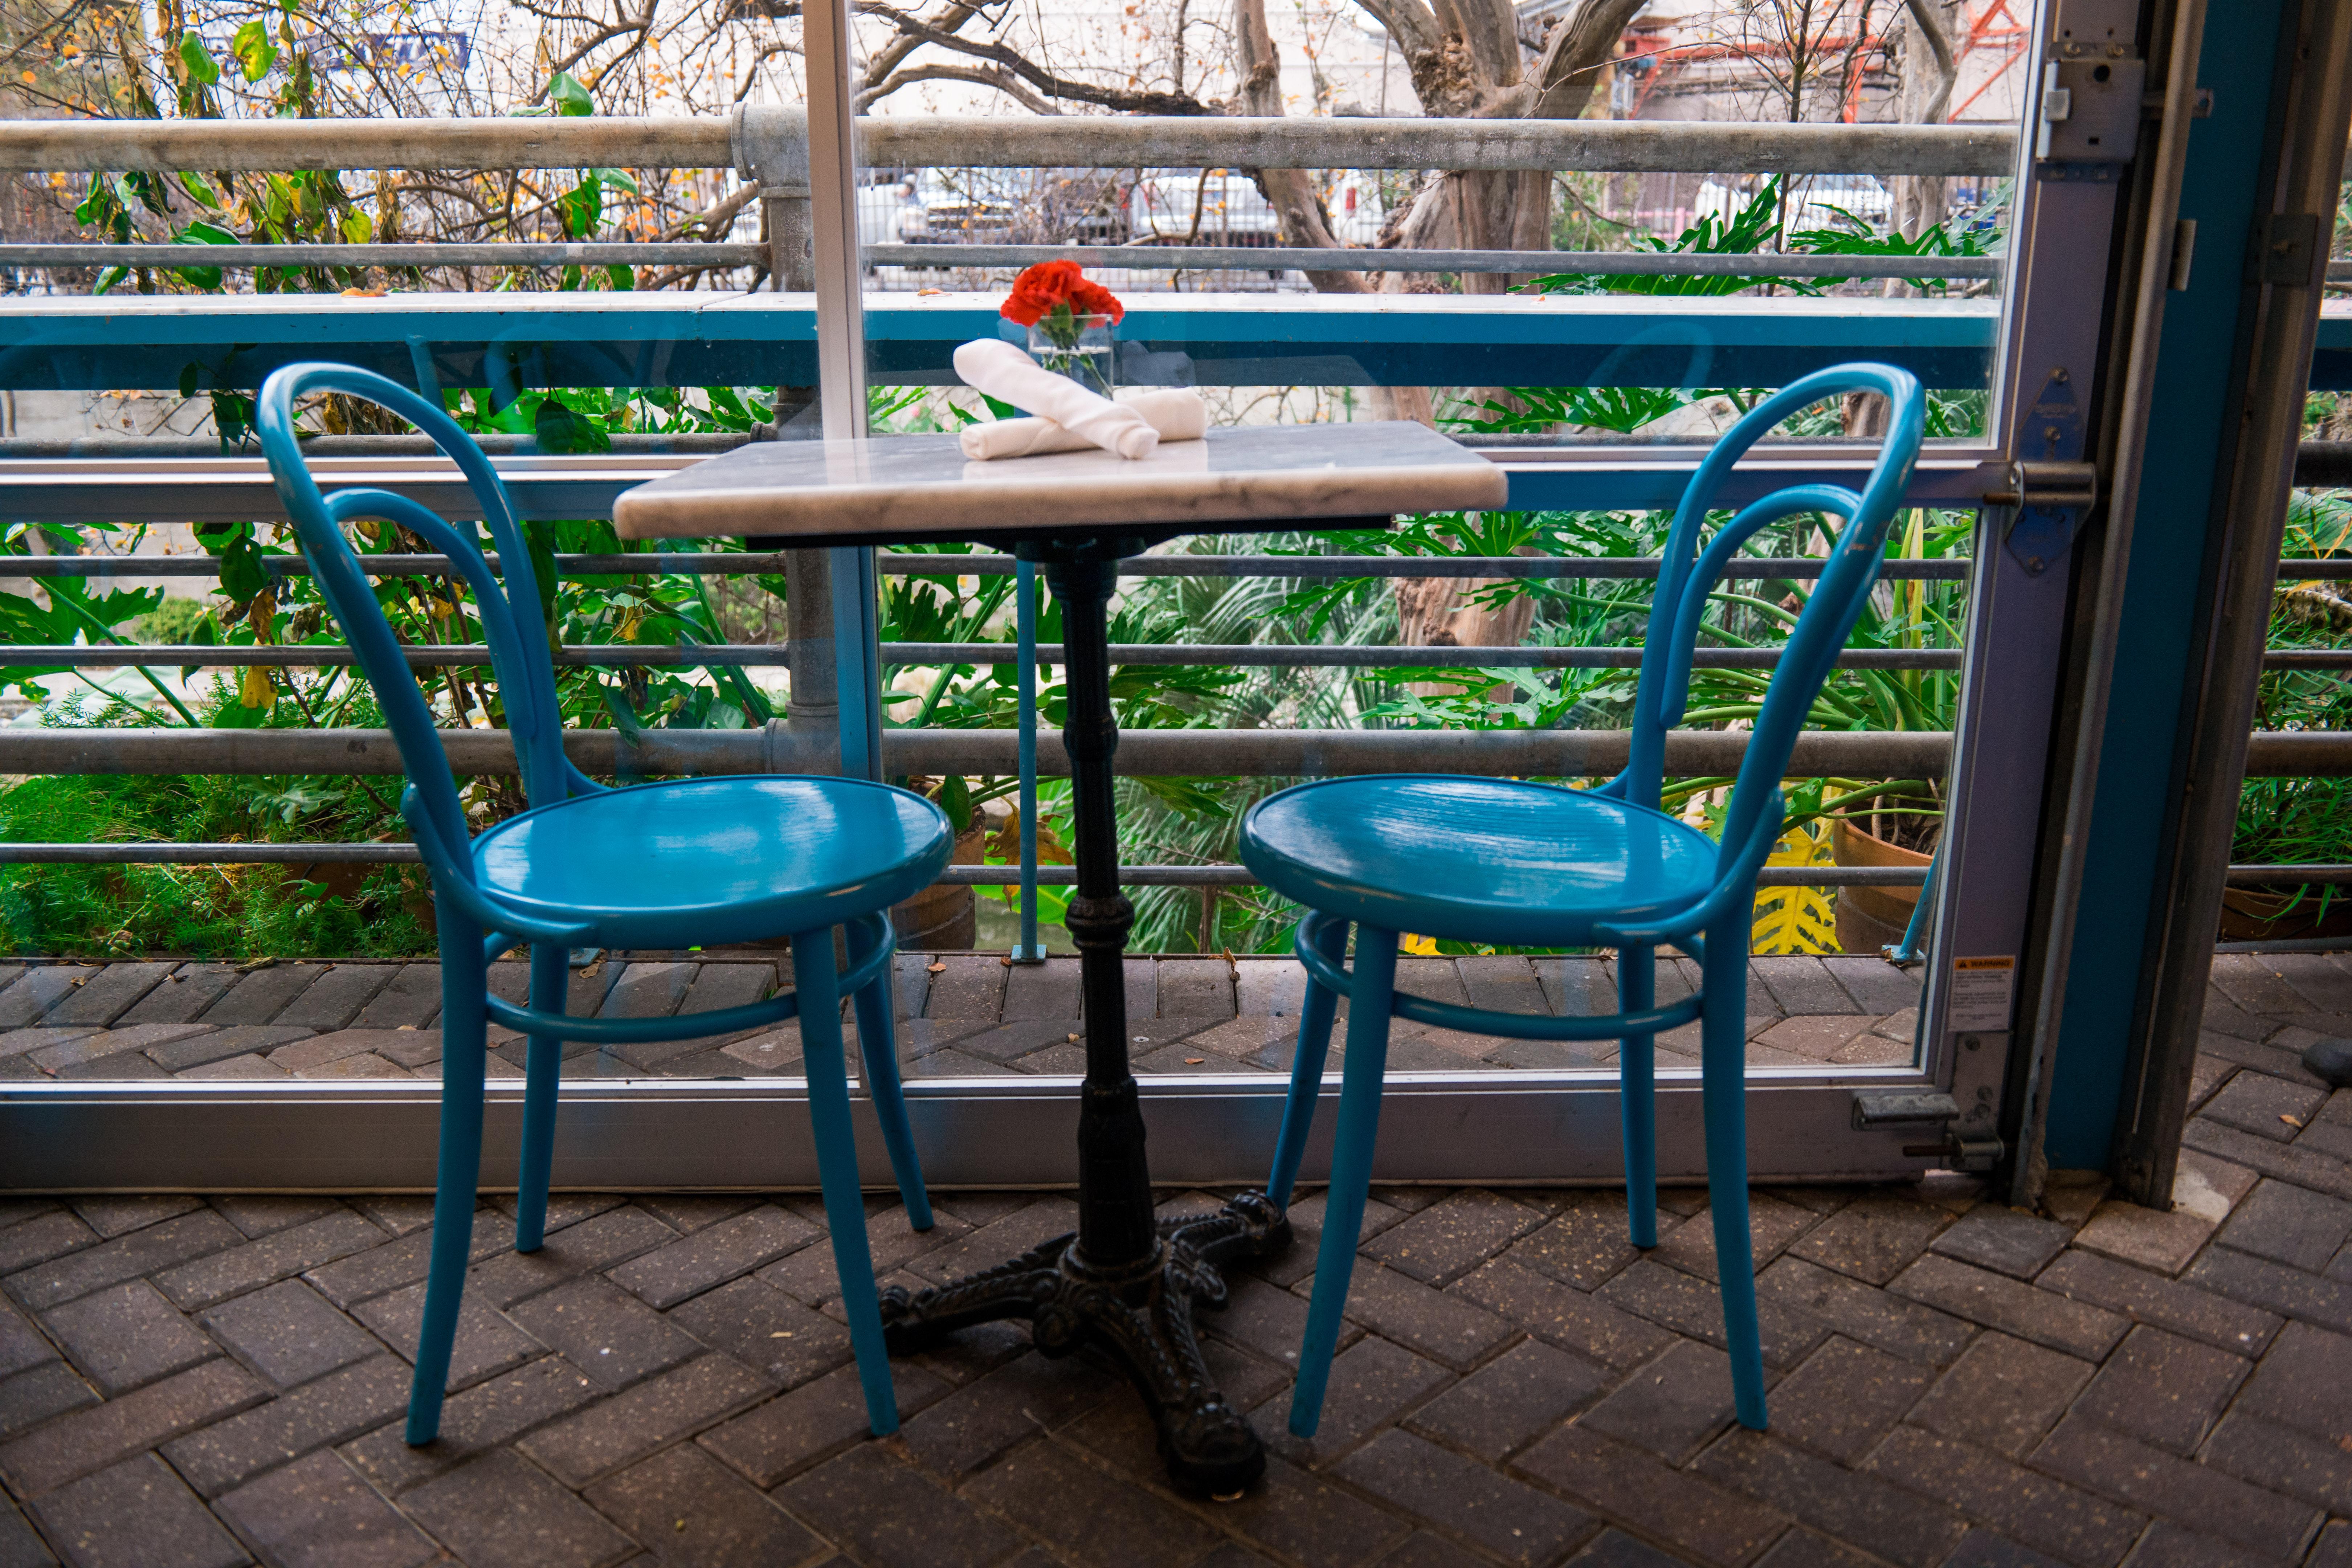 File:Cafe Table At Ocho Restaurant, San Antonio, Texas (2014 12